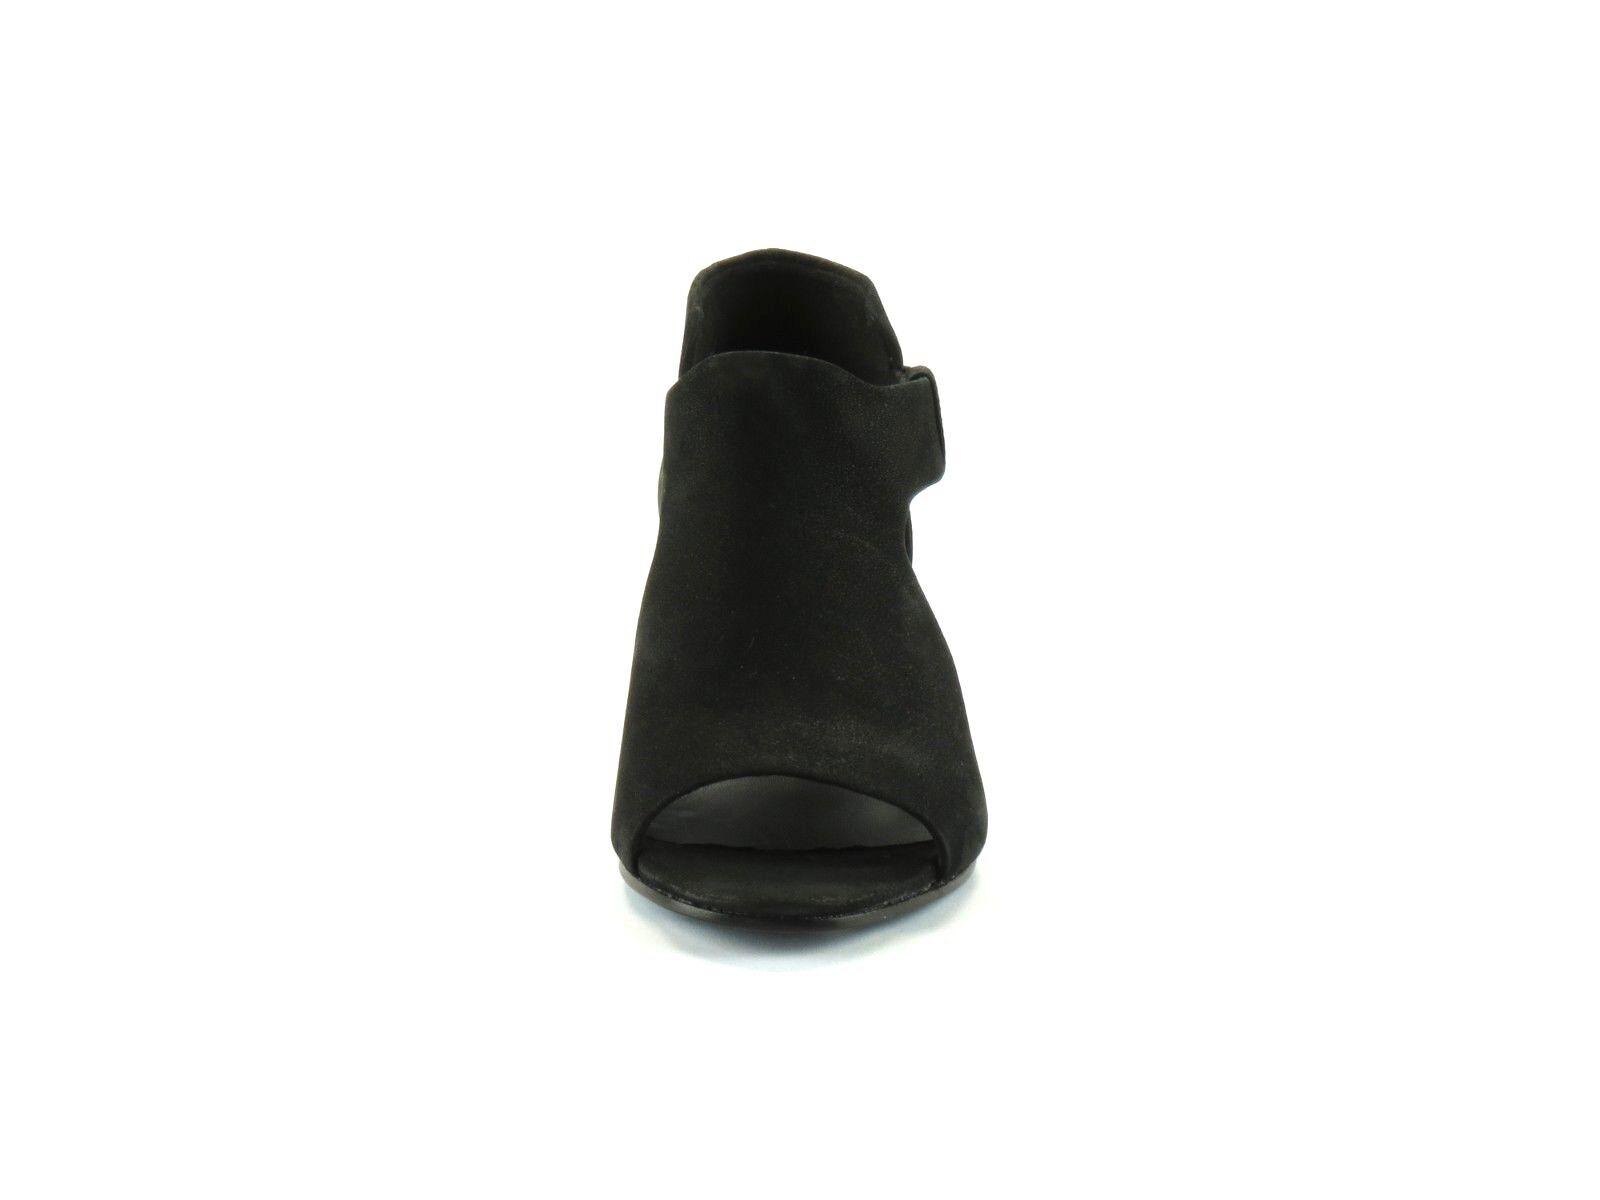 Eileen Fisher Iris nero Tumbled Nubuck Nubuck Nubuck Leather Stacked Heel Open Toe Sandal 6 7f61ea